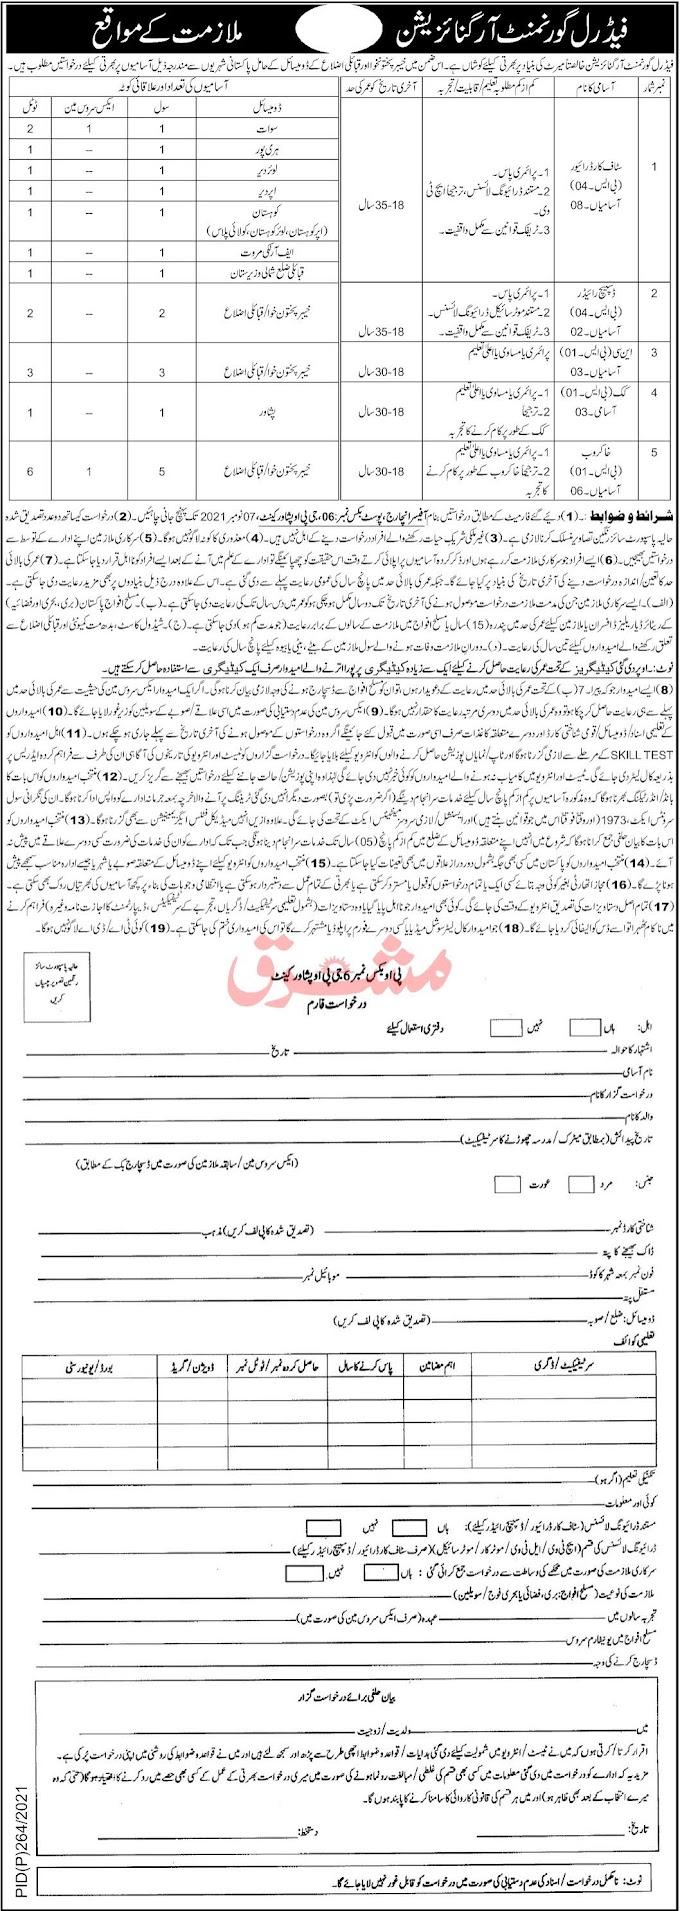 Federal Government Organization PO Box No.6 GPO Peshawar Jobs 2021